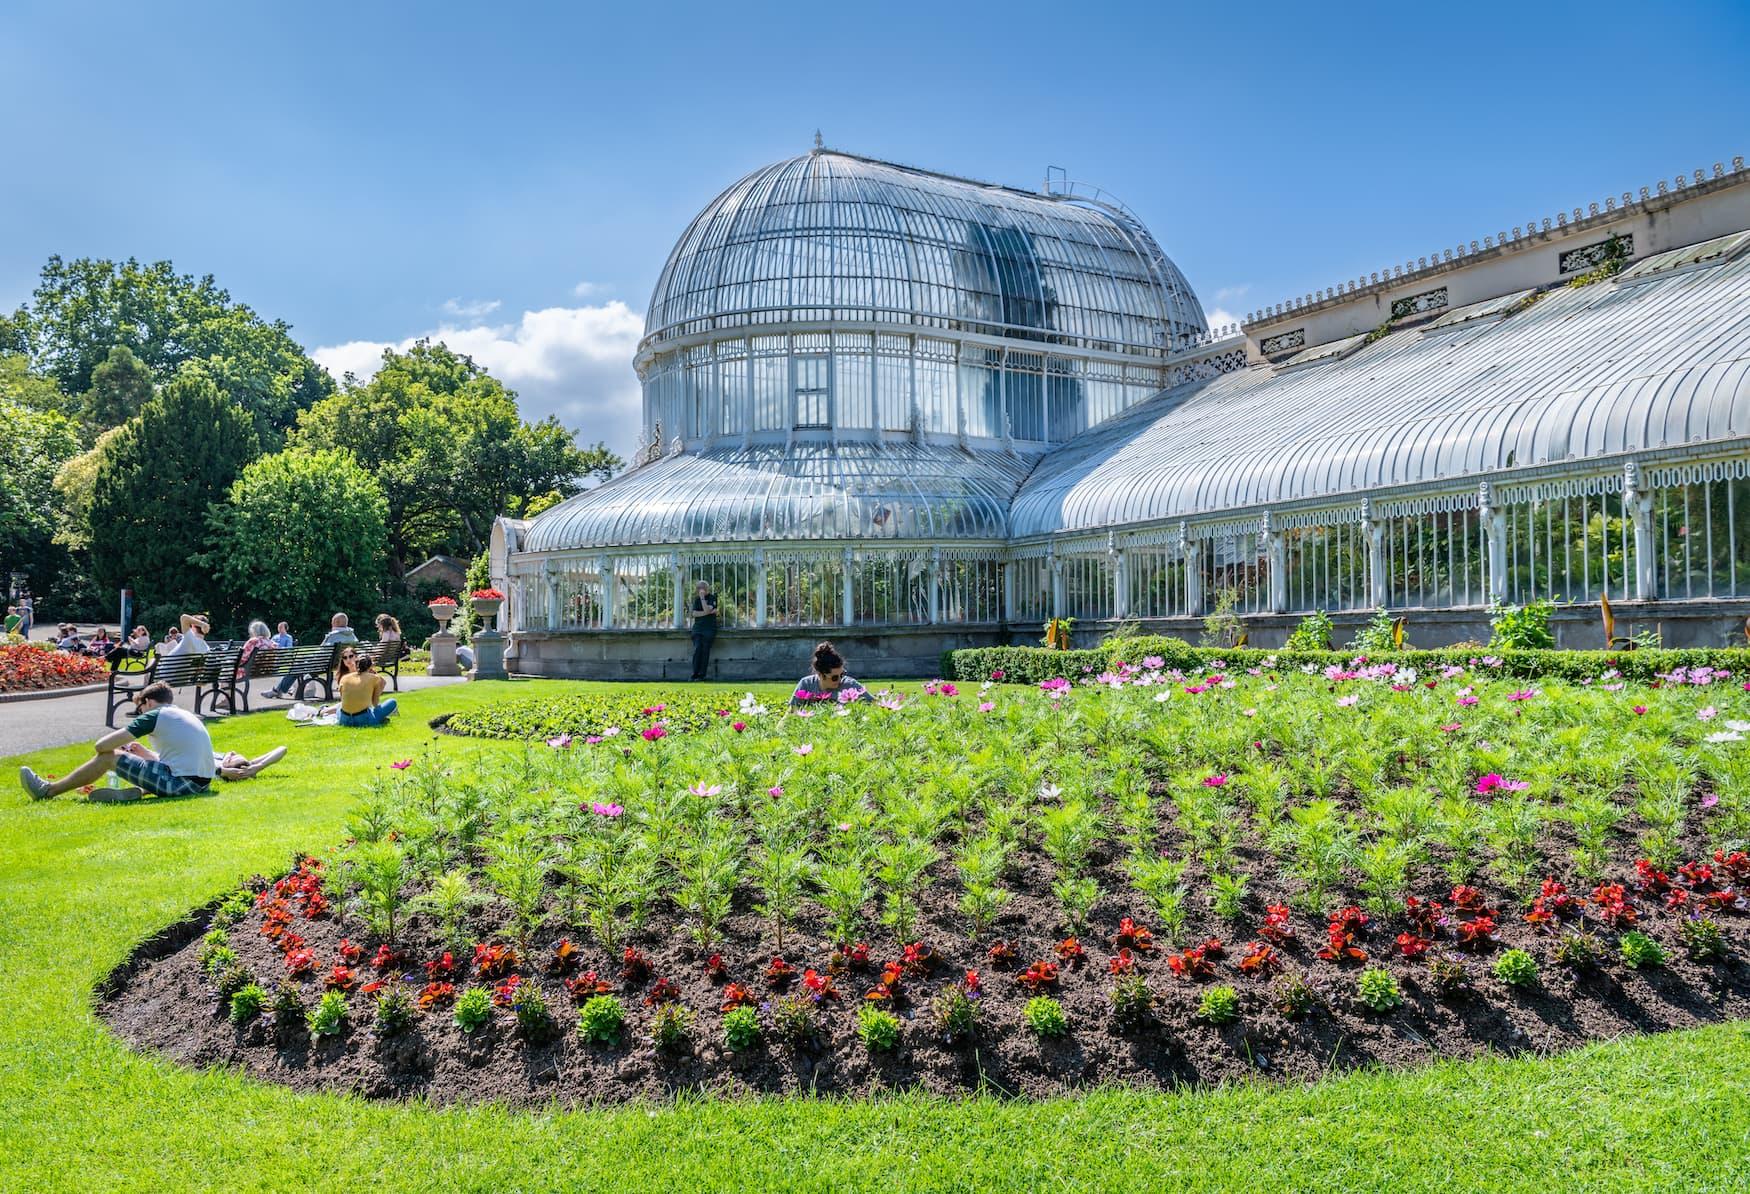 Belfast Botanic Gardens & Palm House, Northern Ireland